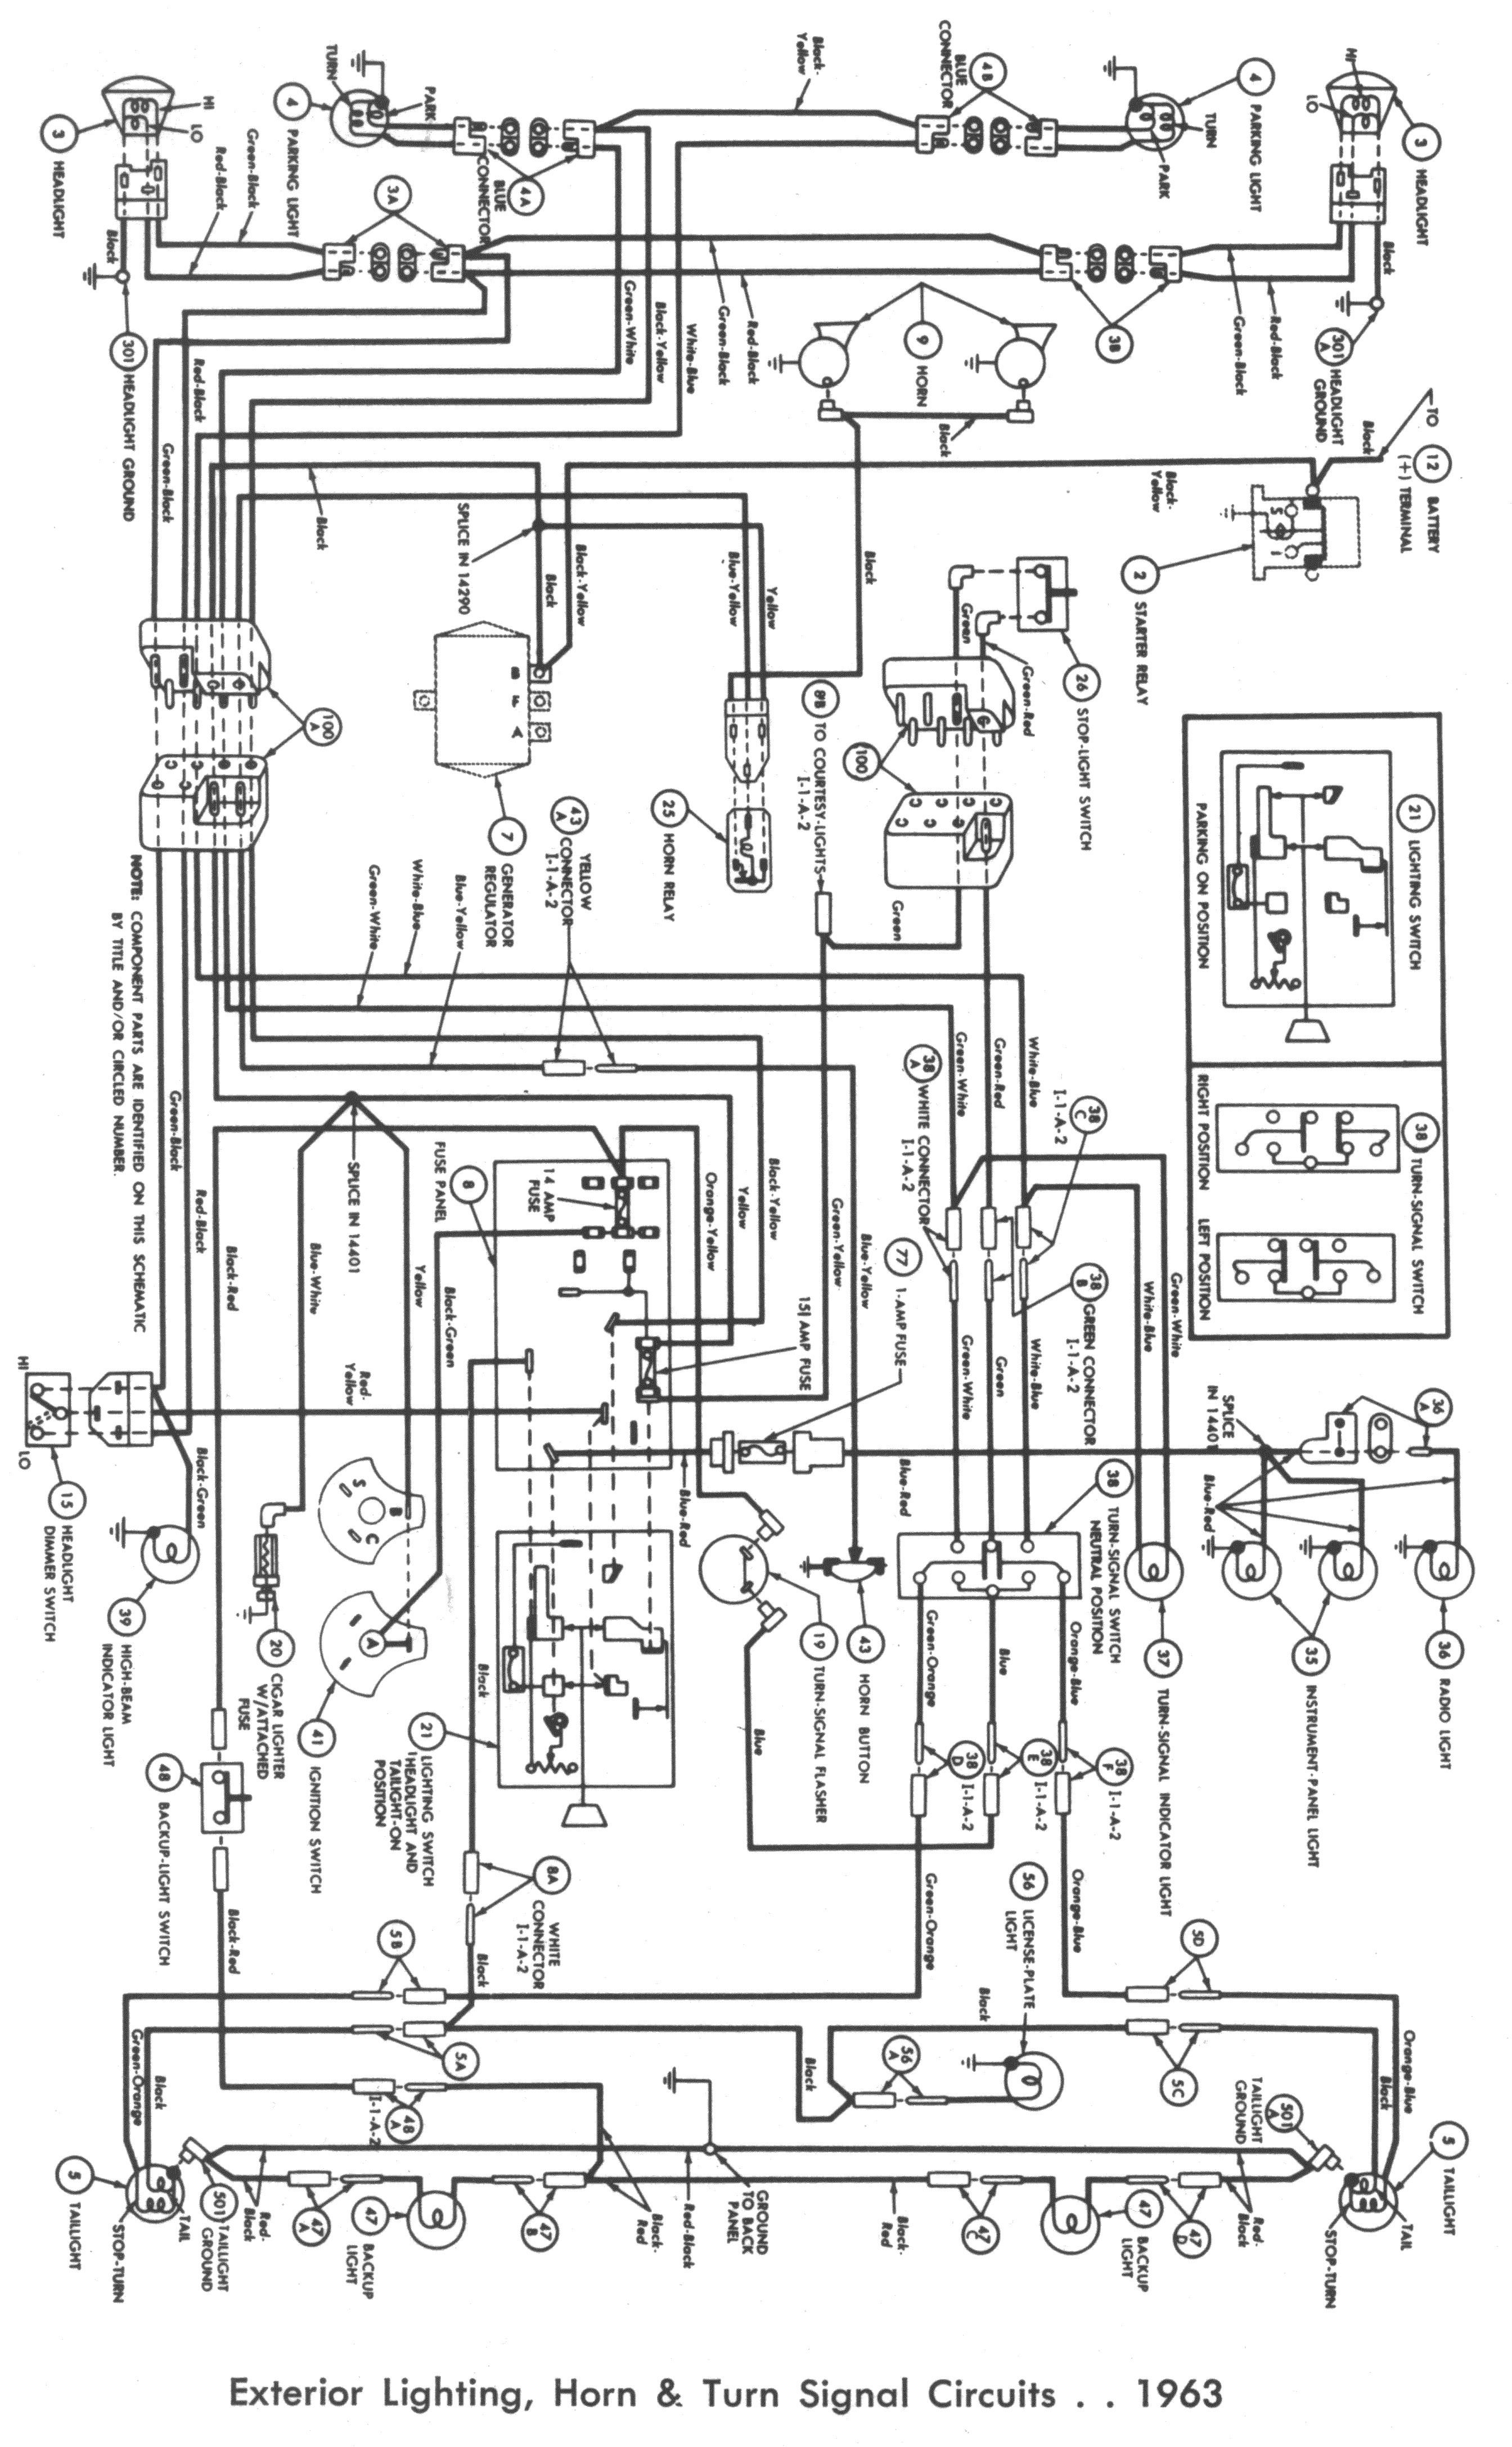 1990 Buick Skylark Fuse Box Wiring Diagrams 1991 Diagram Auto